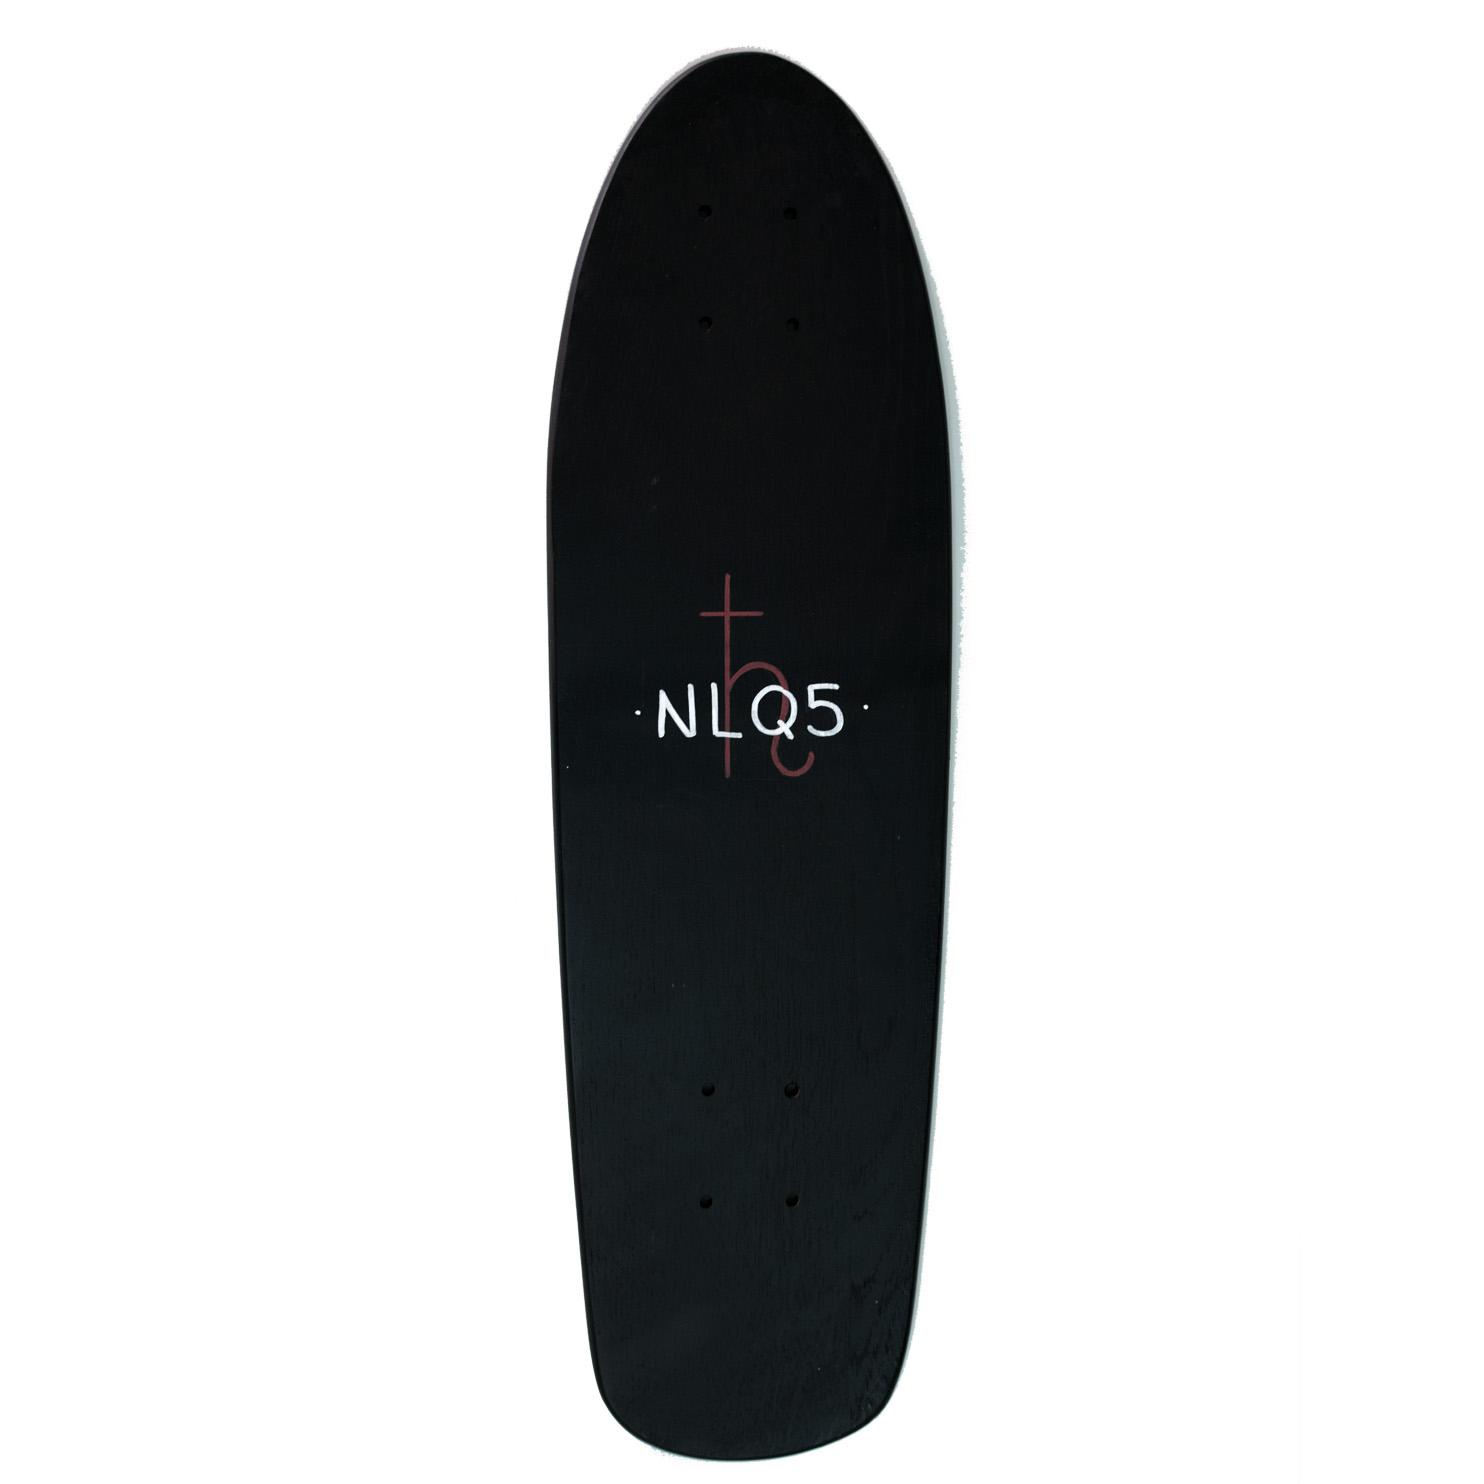 rider-foreber-nlq5-longdays-longboards-1